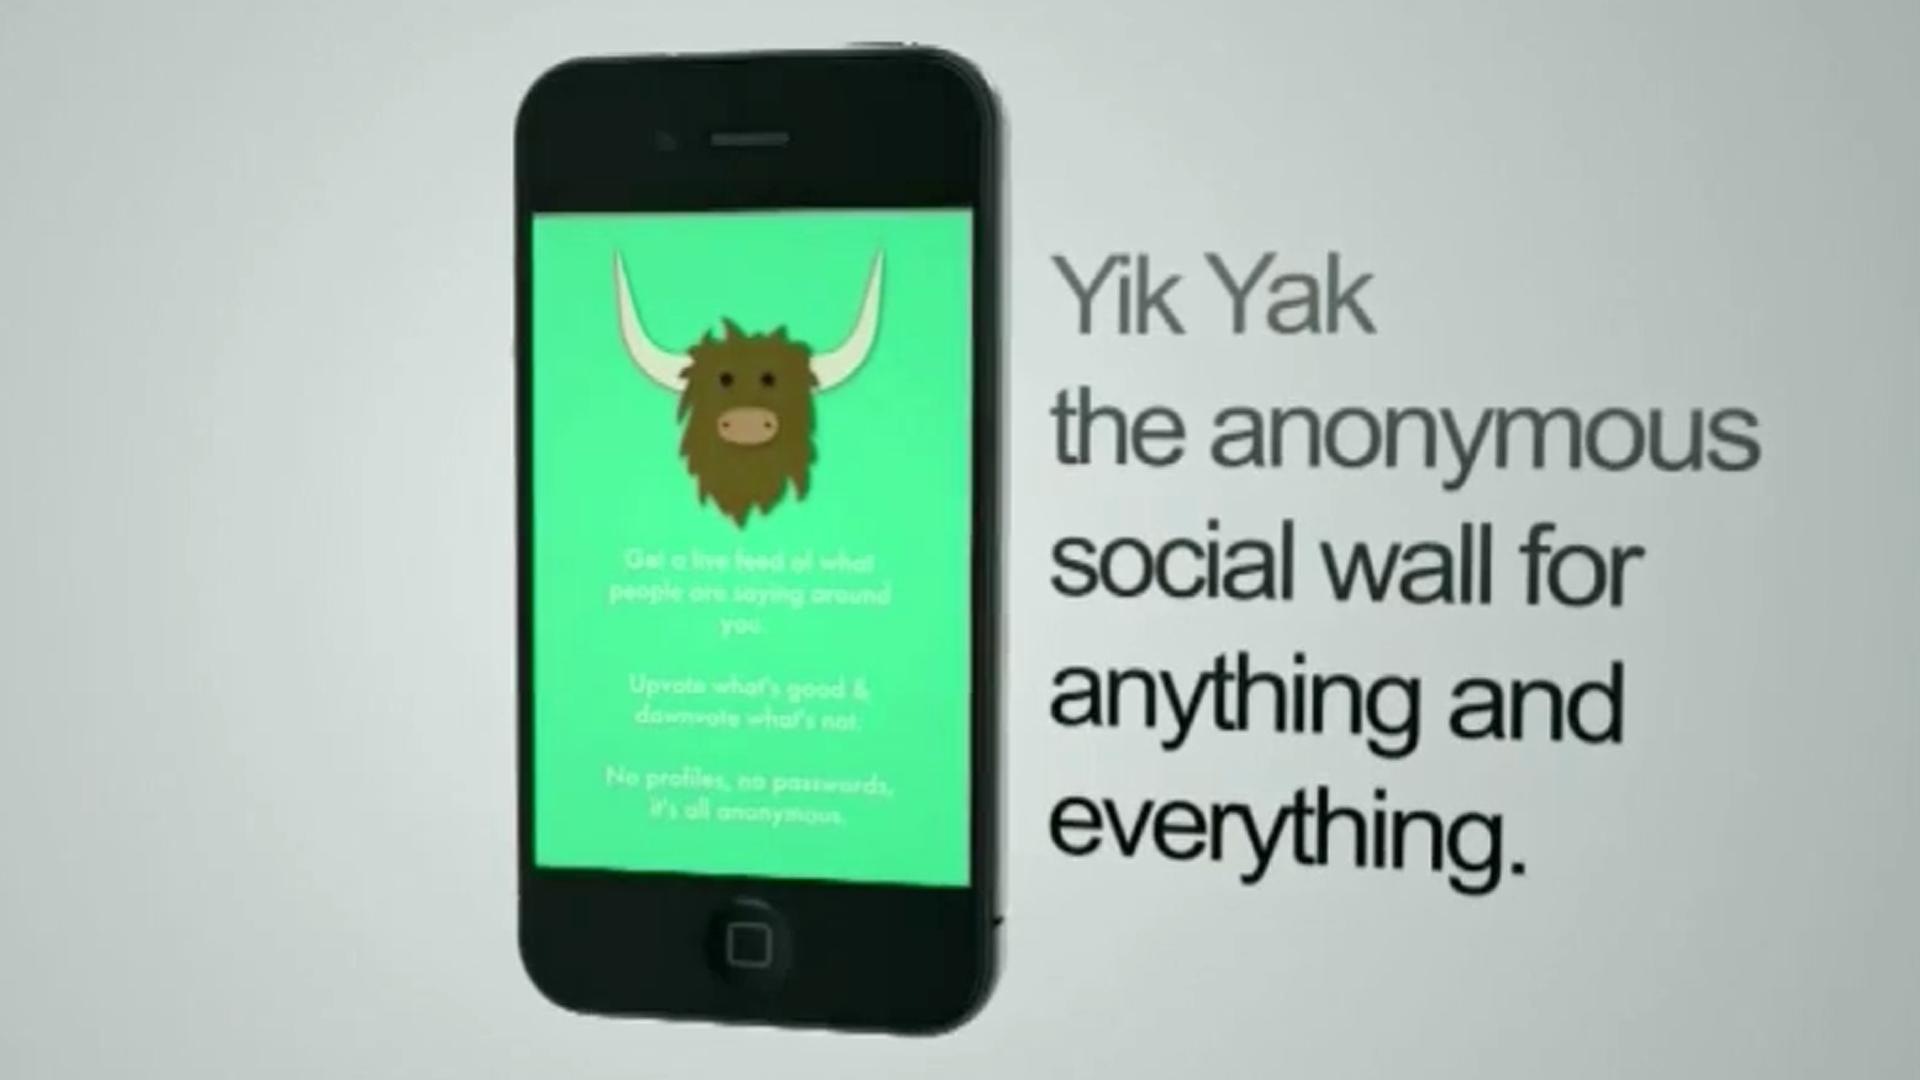 Universities consider blocking controversial app :: WRAL com